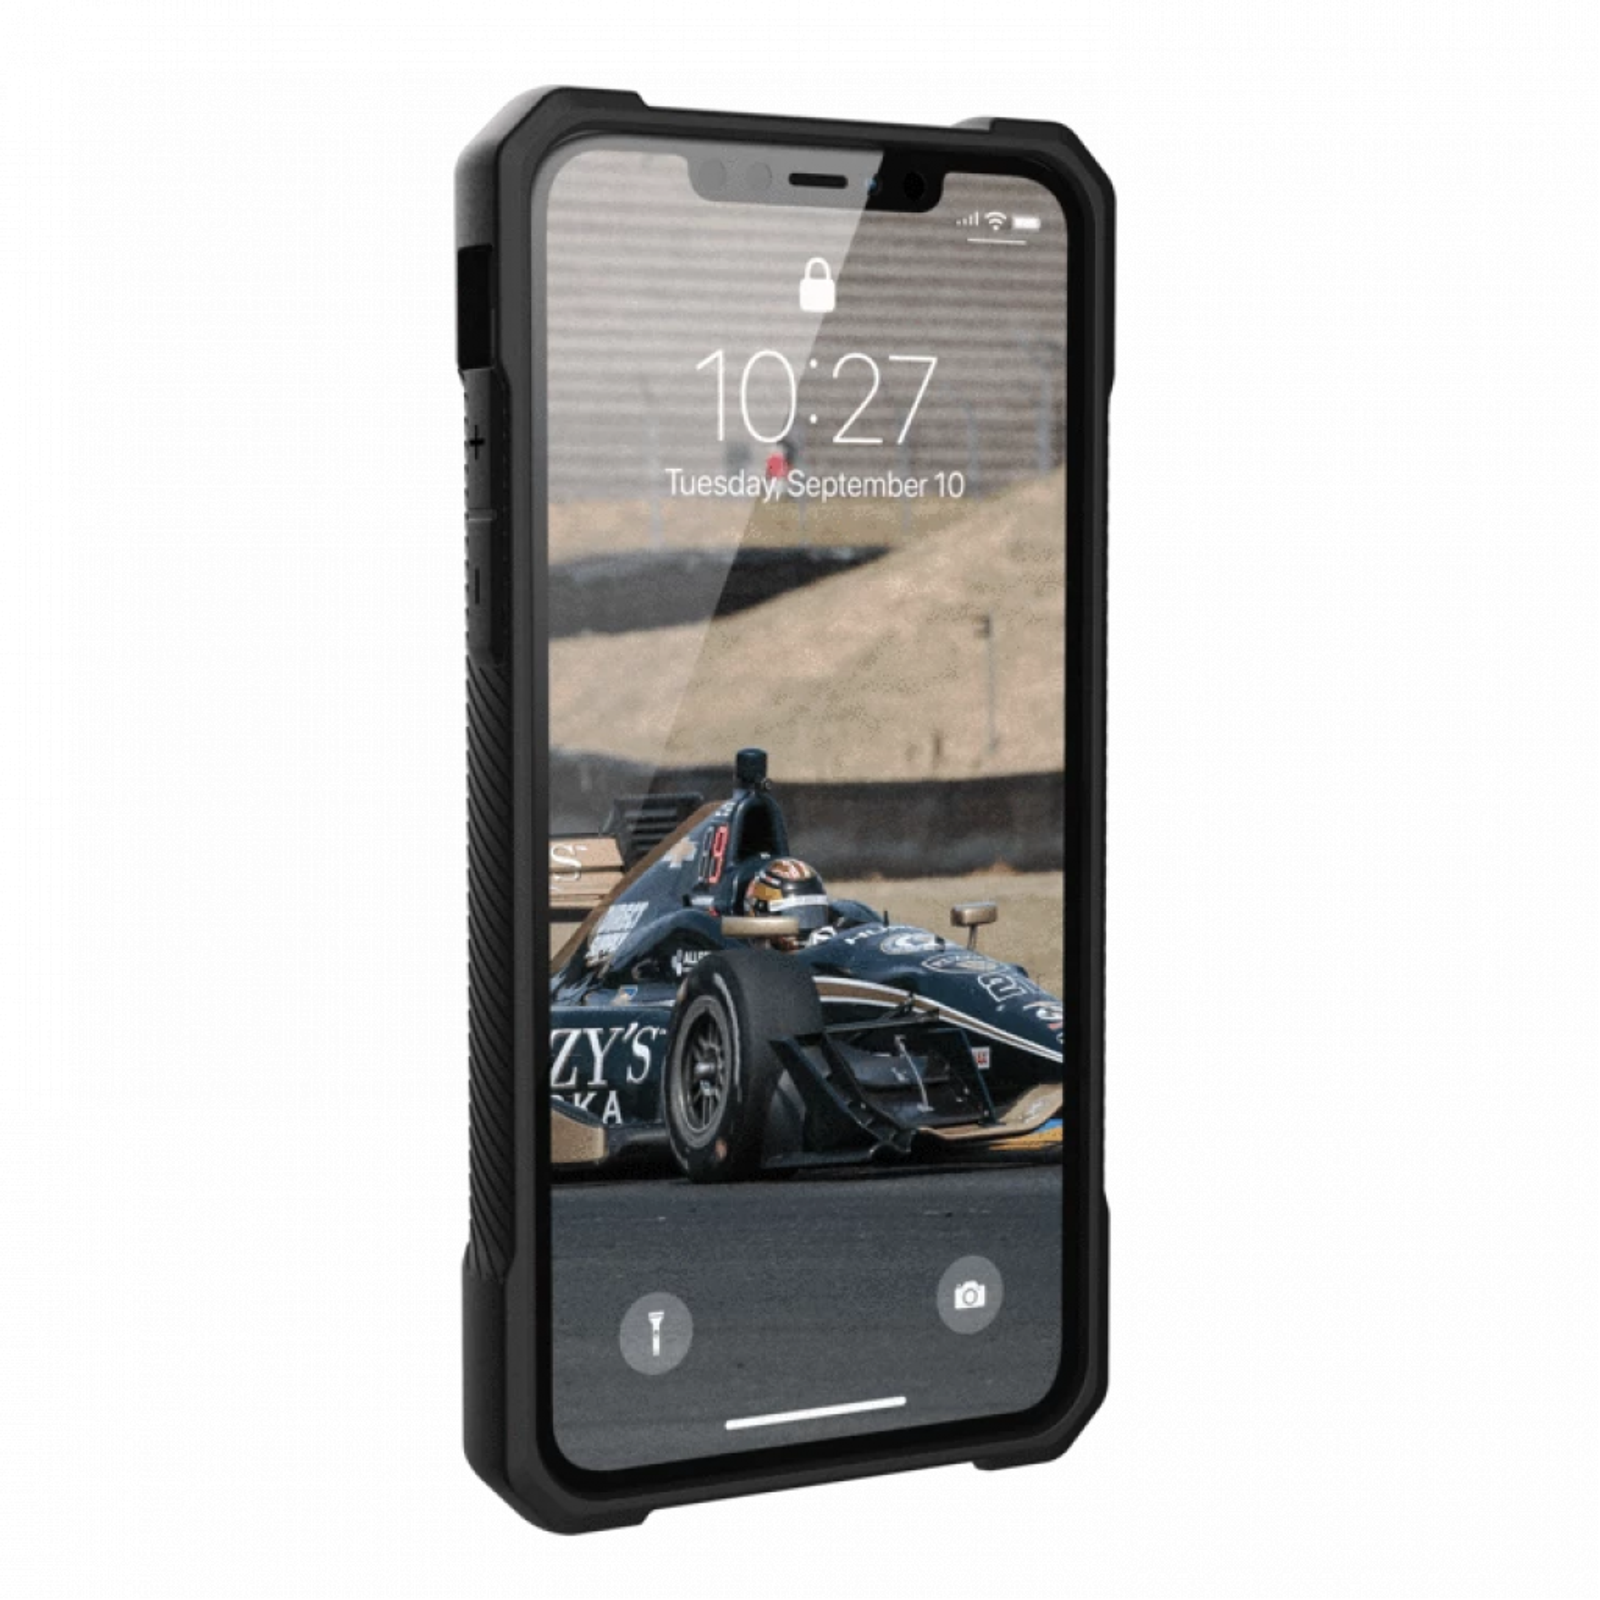 Чехол для моб. телефона Uag iPhone 11 Pro Max Monarch, Black (111721114040) изображение 4